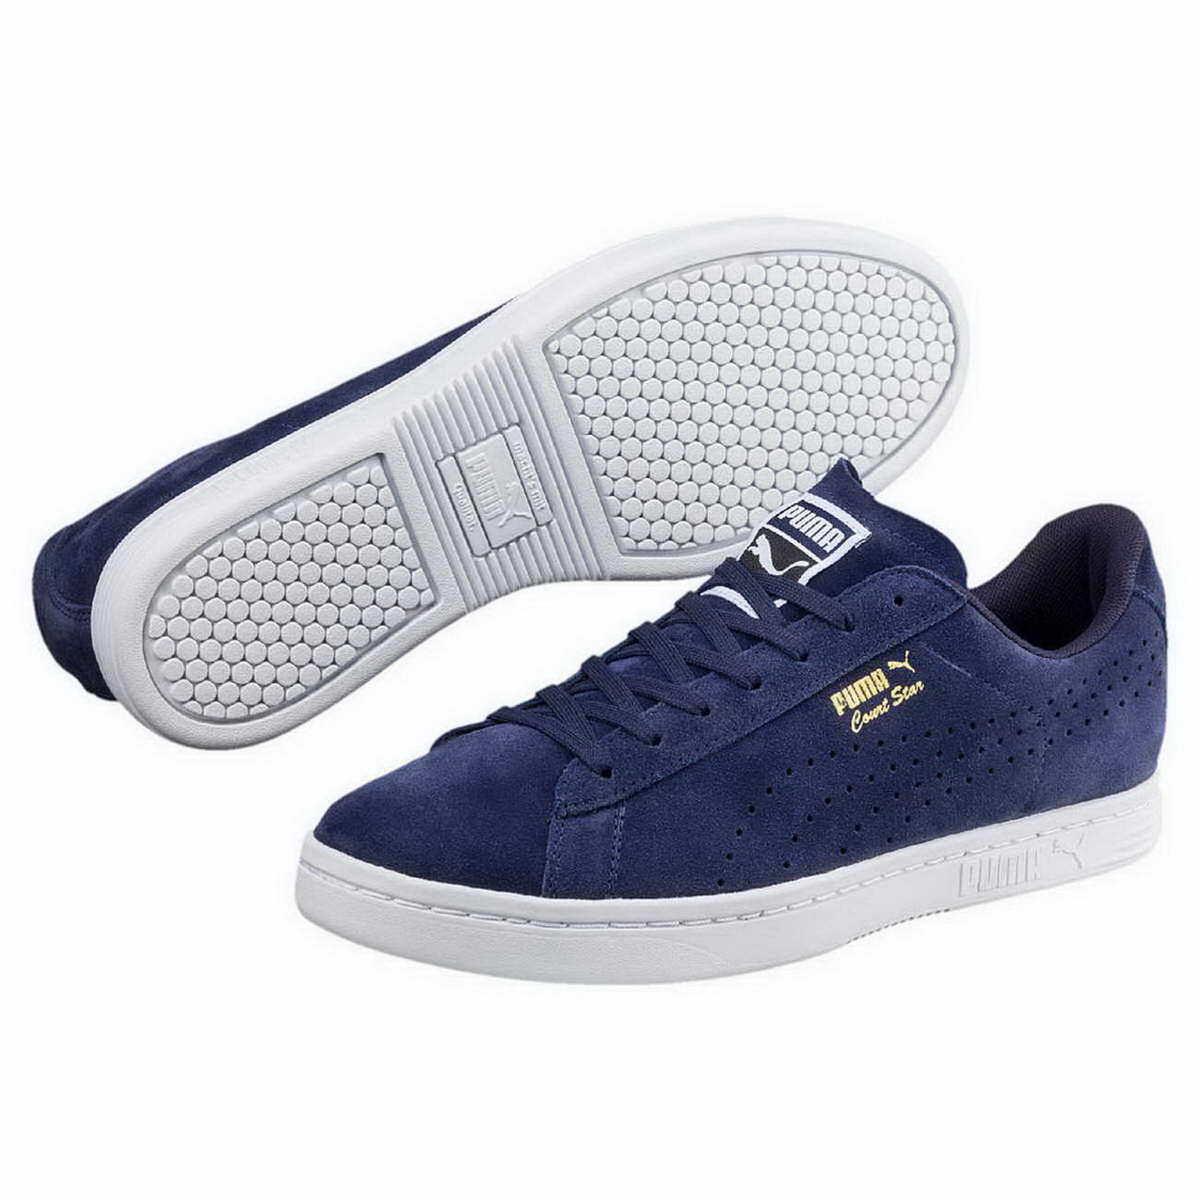 Puma Sneaker Court Star Suede softfoam peacoat blue Freizeit Turnschuhe 364621